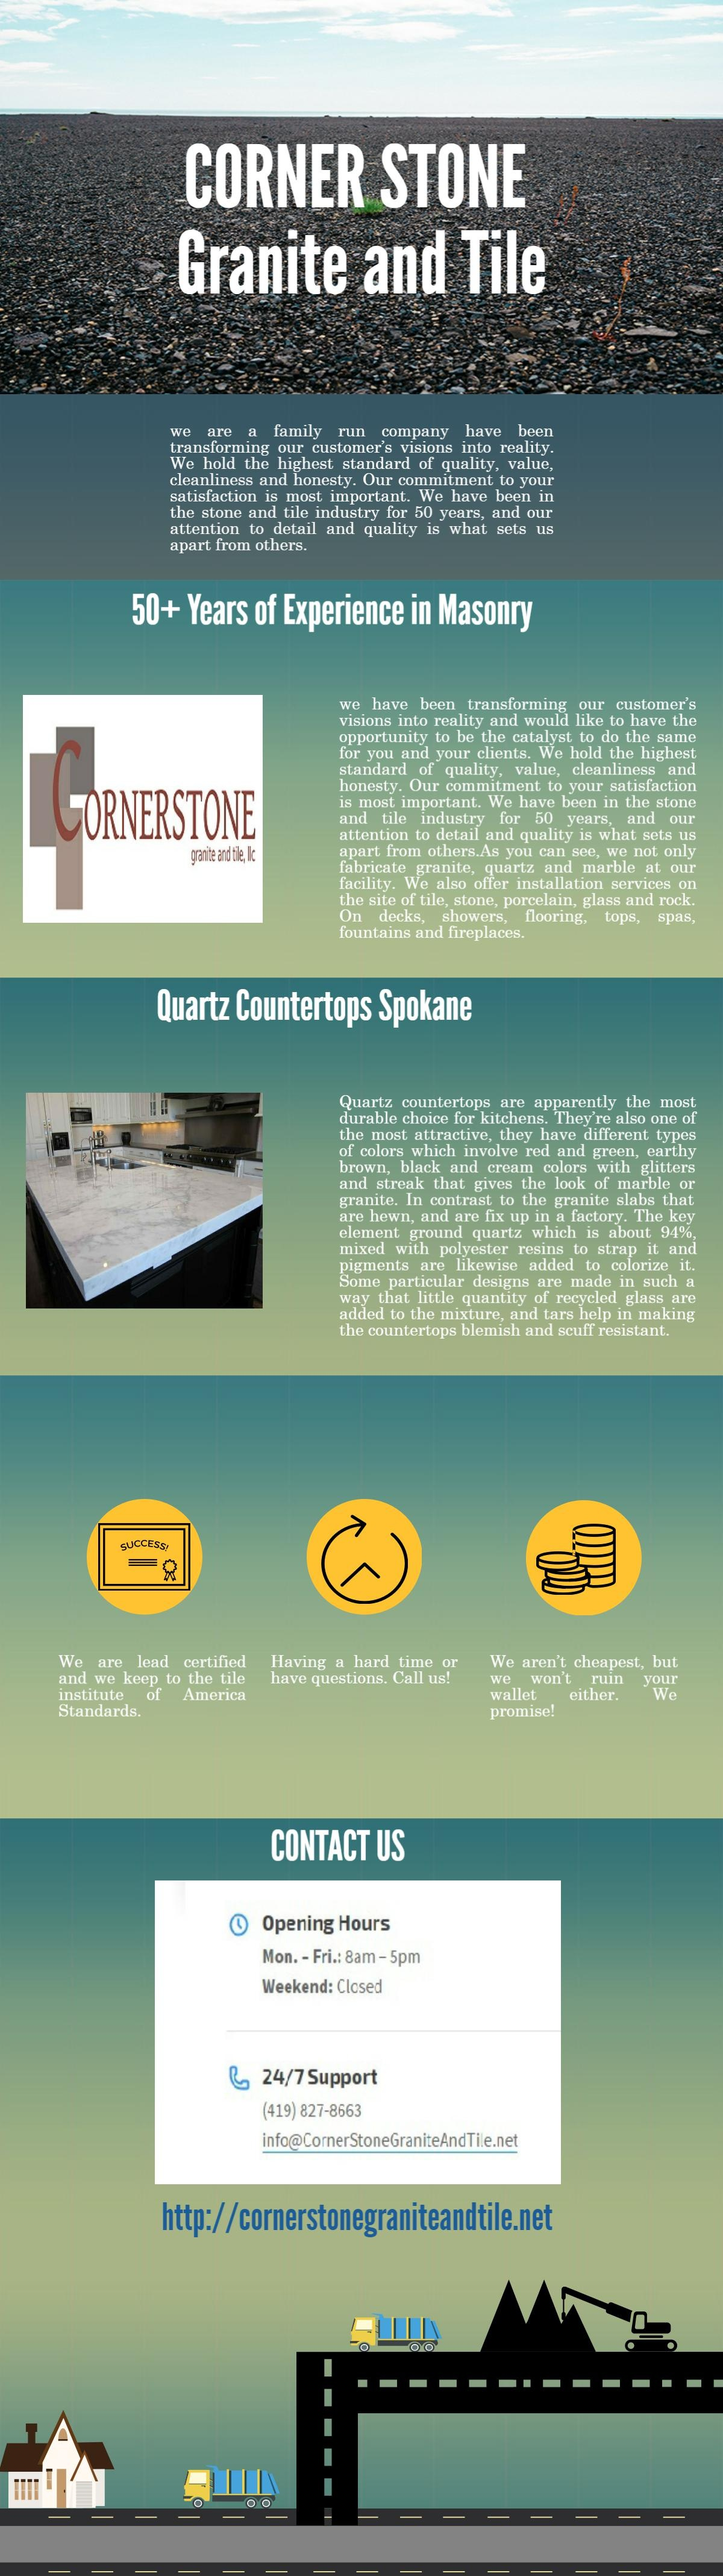 Granite Countertops Spokane Http://cornerstonegraniteandtile.net/